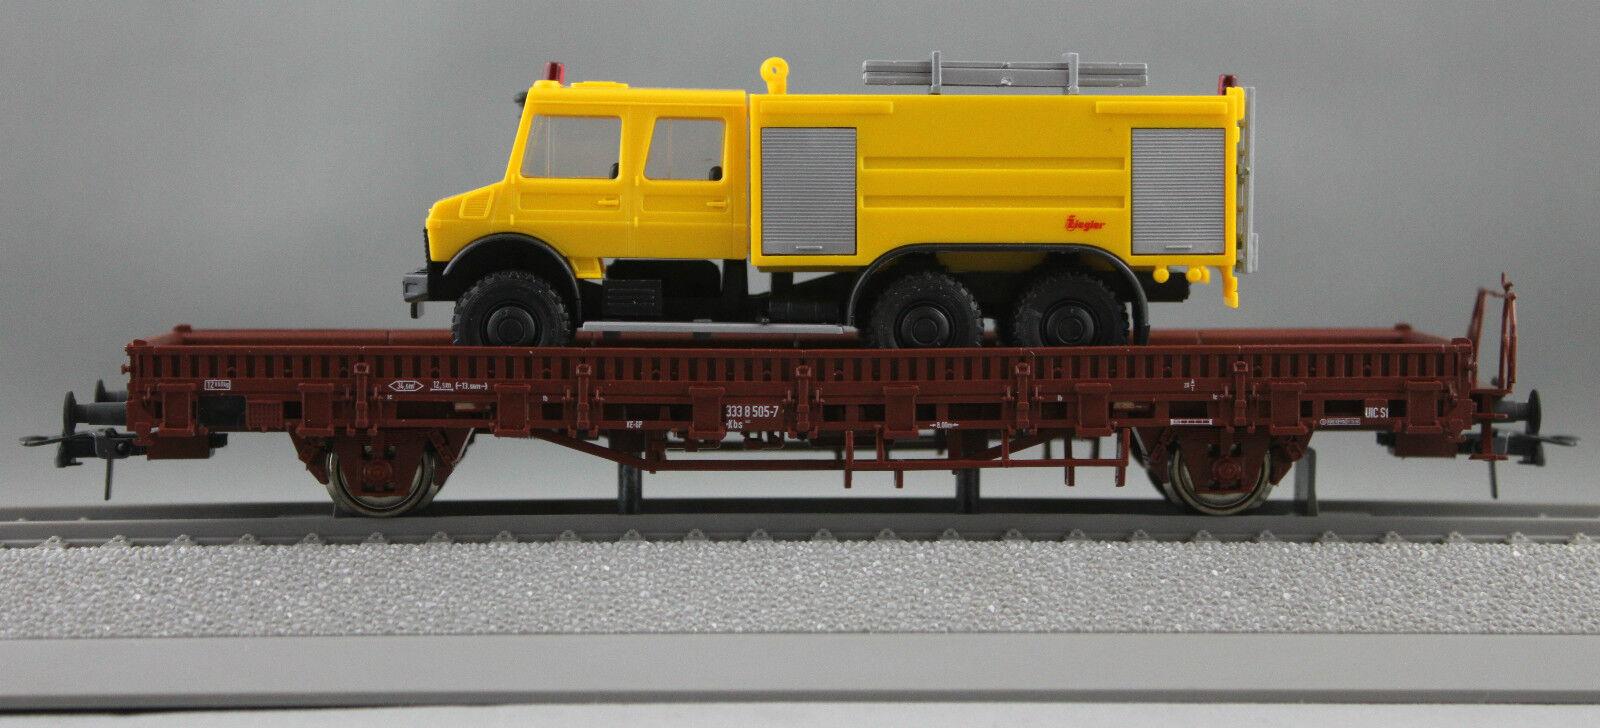 Roco HO - DB Stake Wagon with Unimog load, 50 Year Limited Edition - 47179